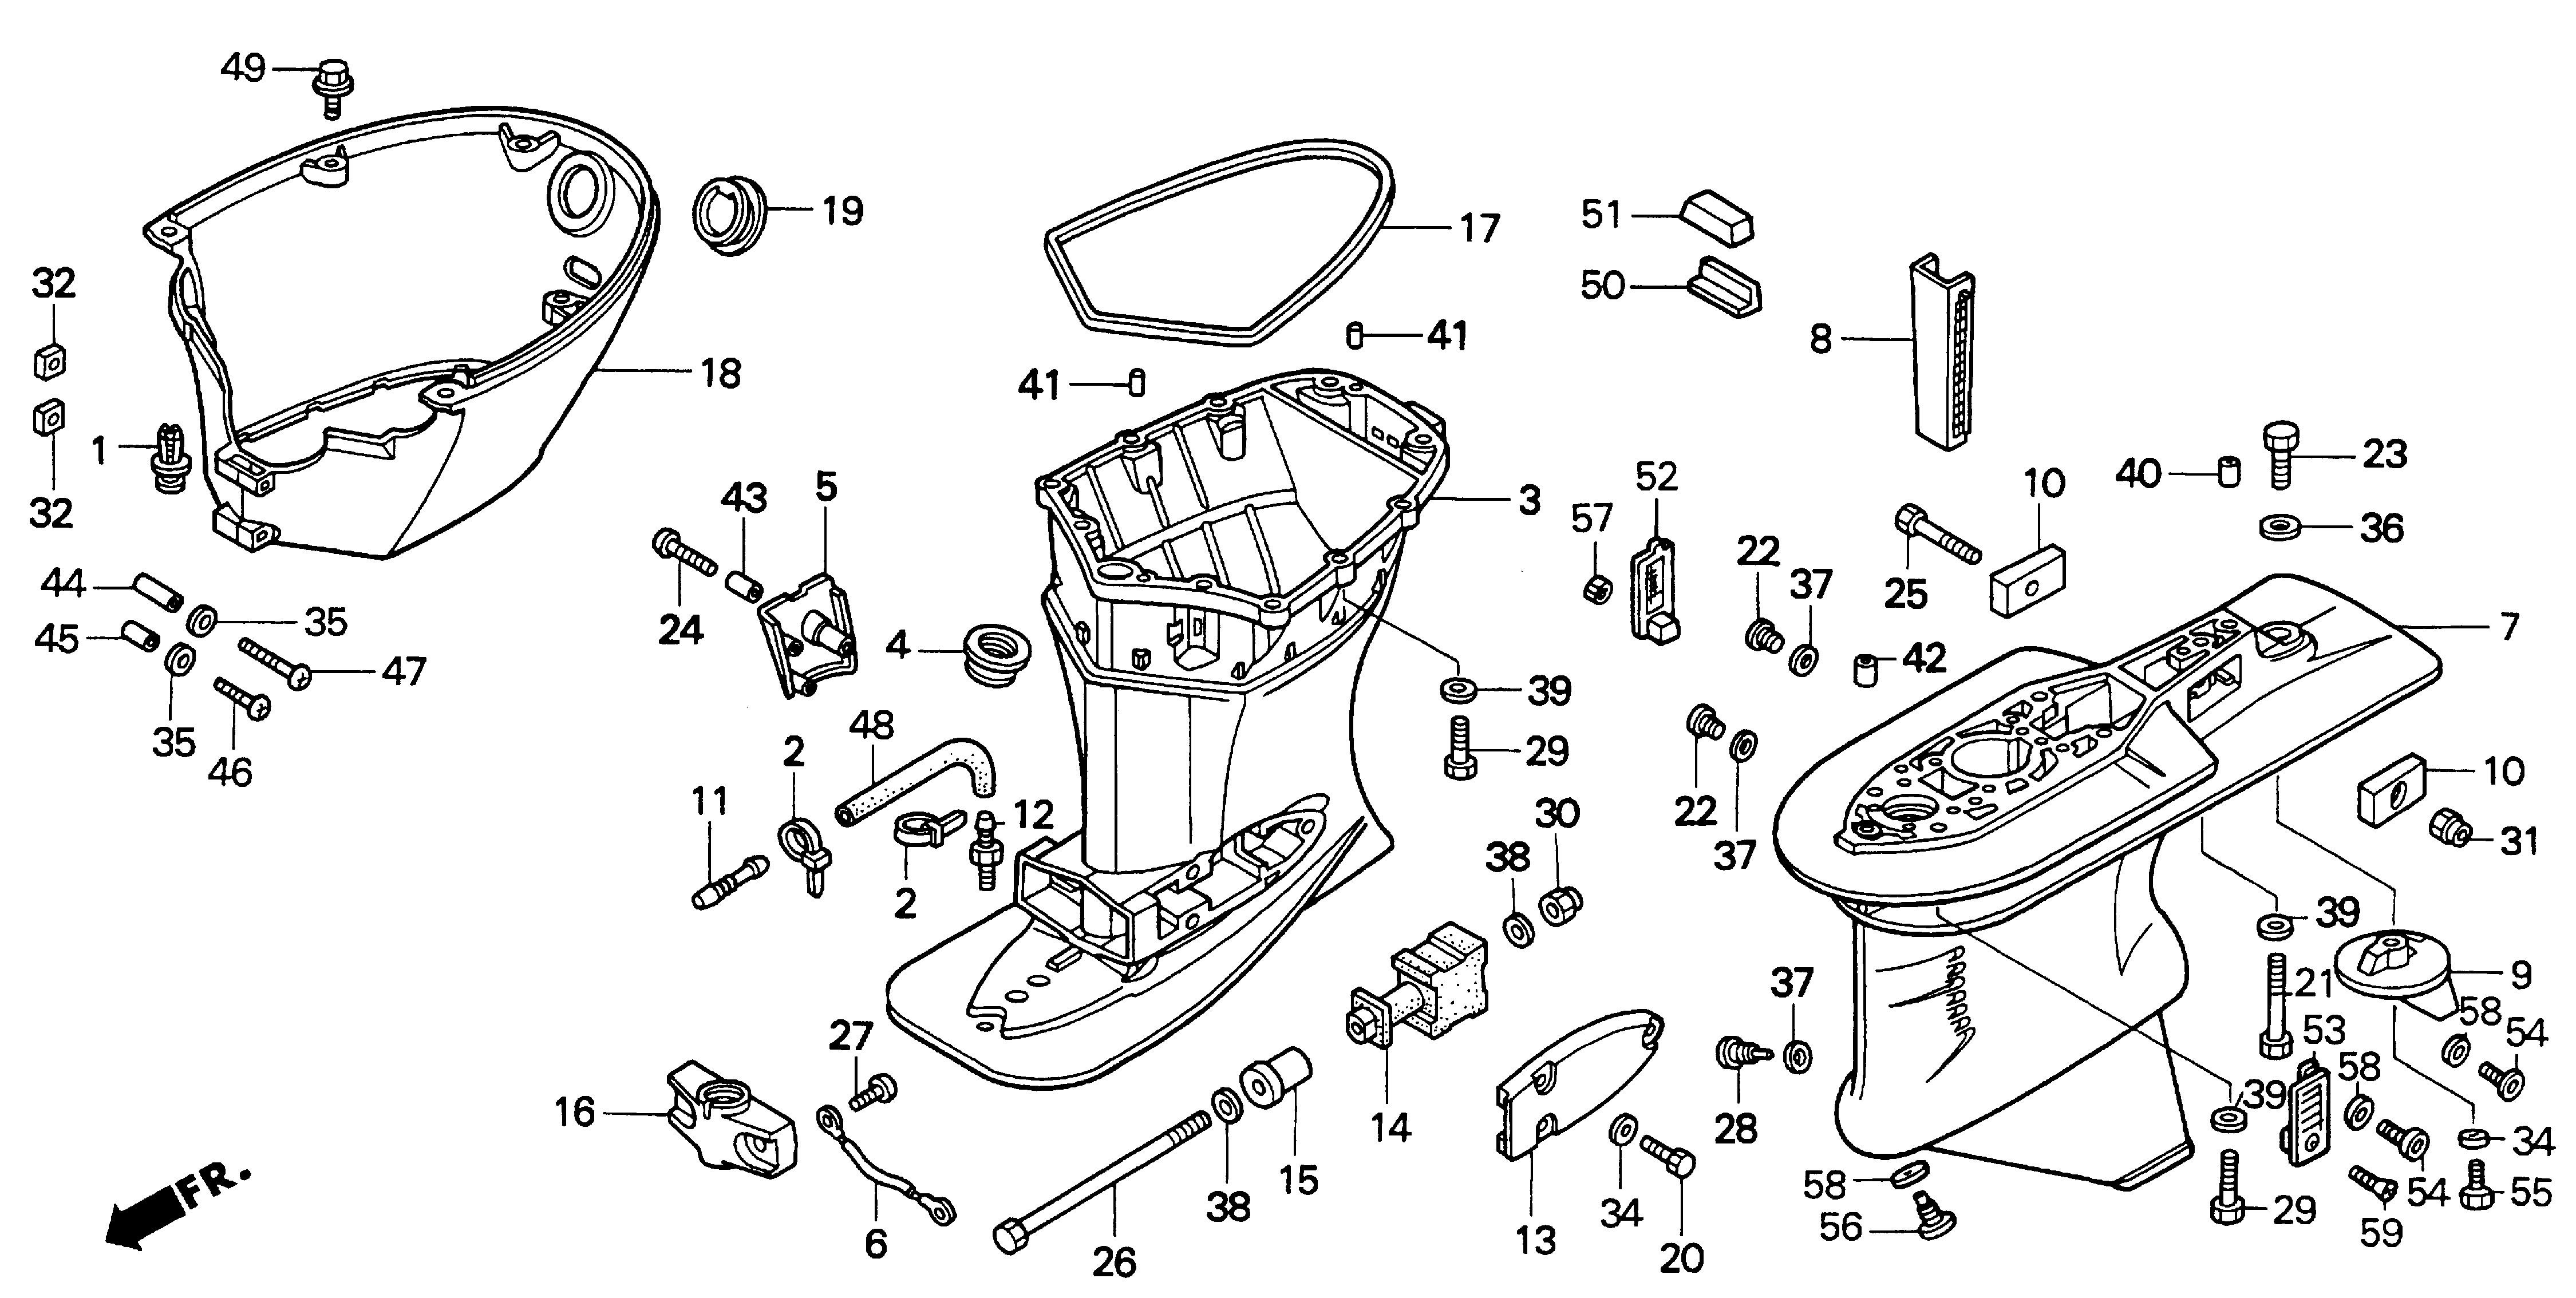 yamaha parts diagram yamaha image wiring diagram yamaha outboard parts diagram smartdraw diagrams on yamaha parts diagram